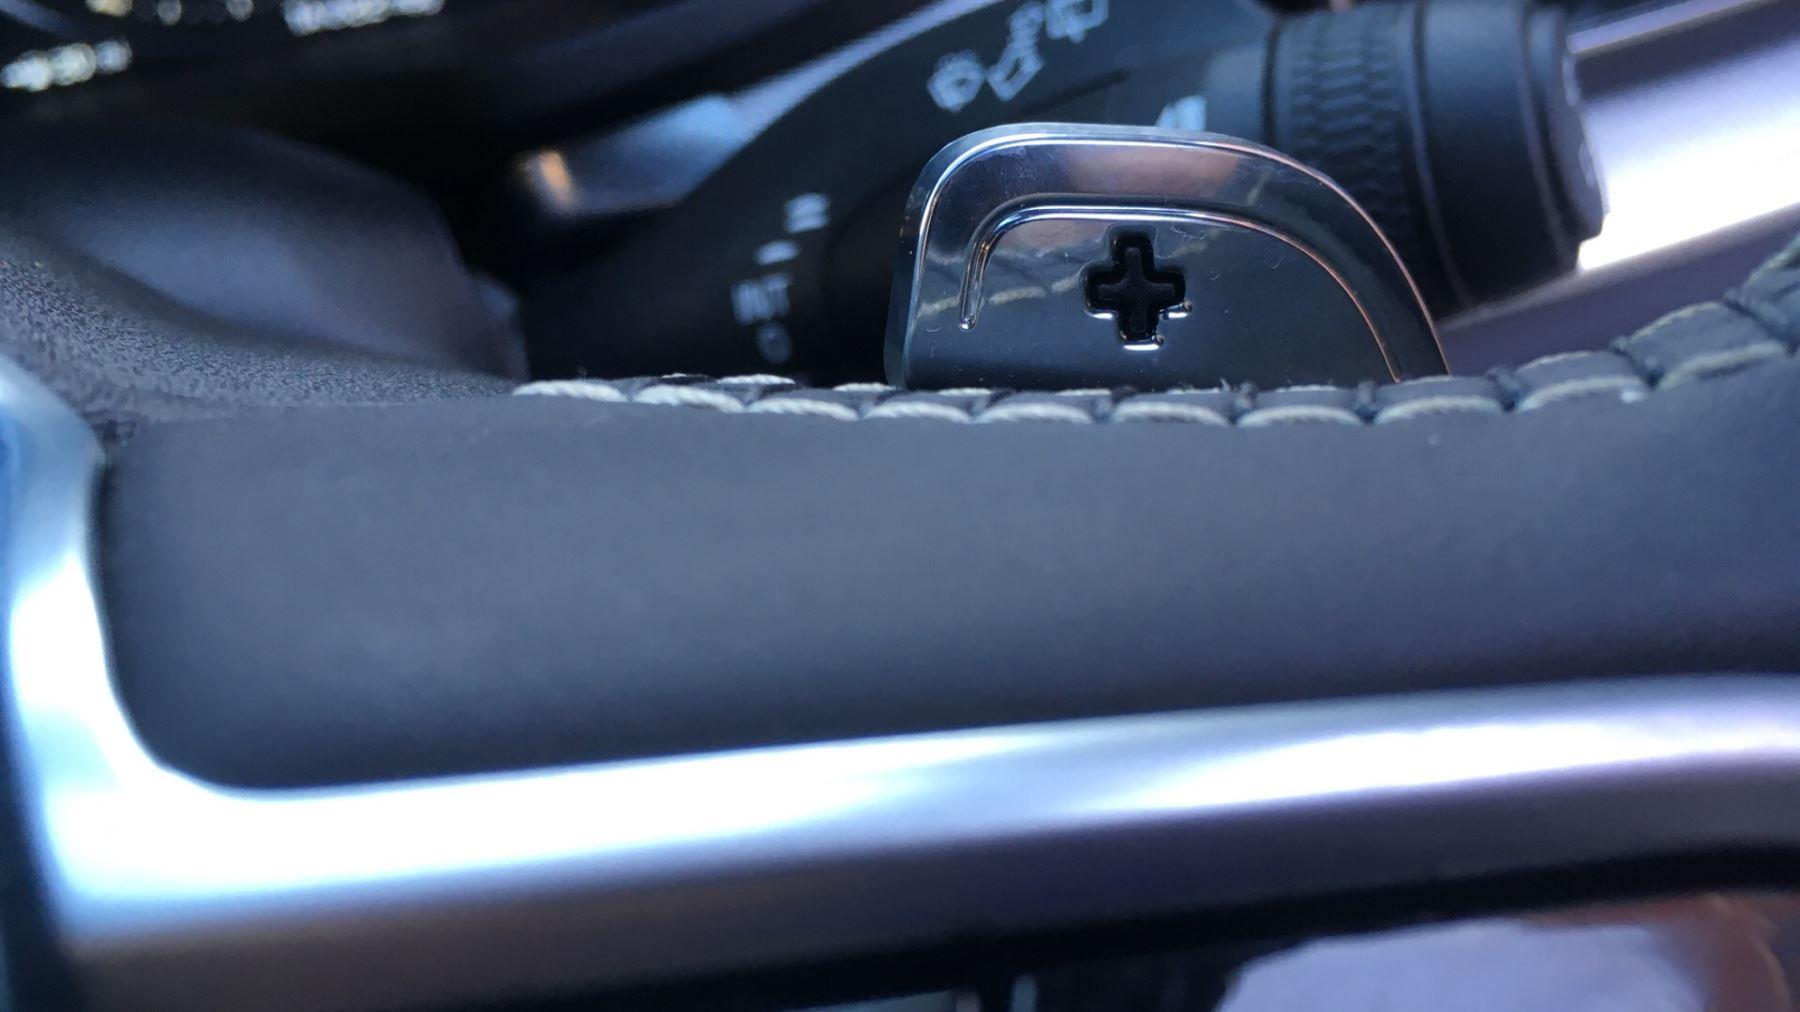 Volvo V60 2.0 D4 [190] R DESIGN 5dr - Volvo on Call, DAB Radio, SAT NAV, Park Assist image 20